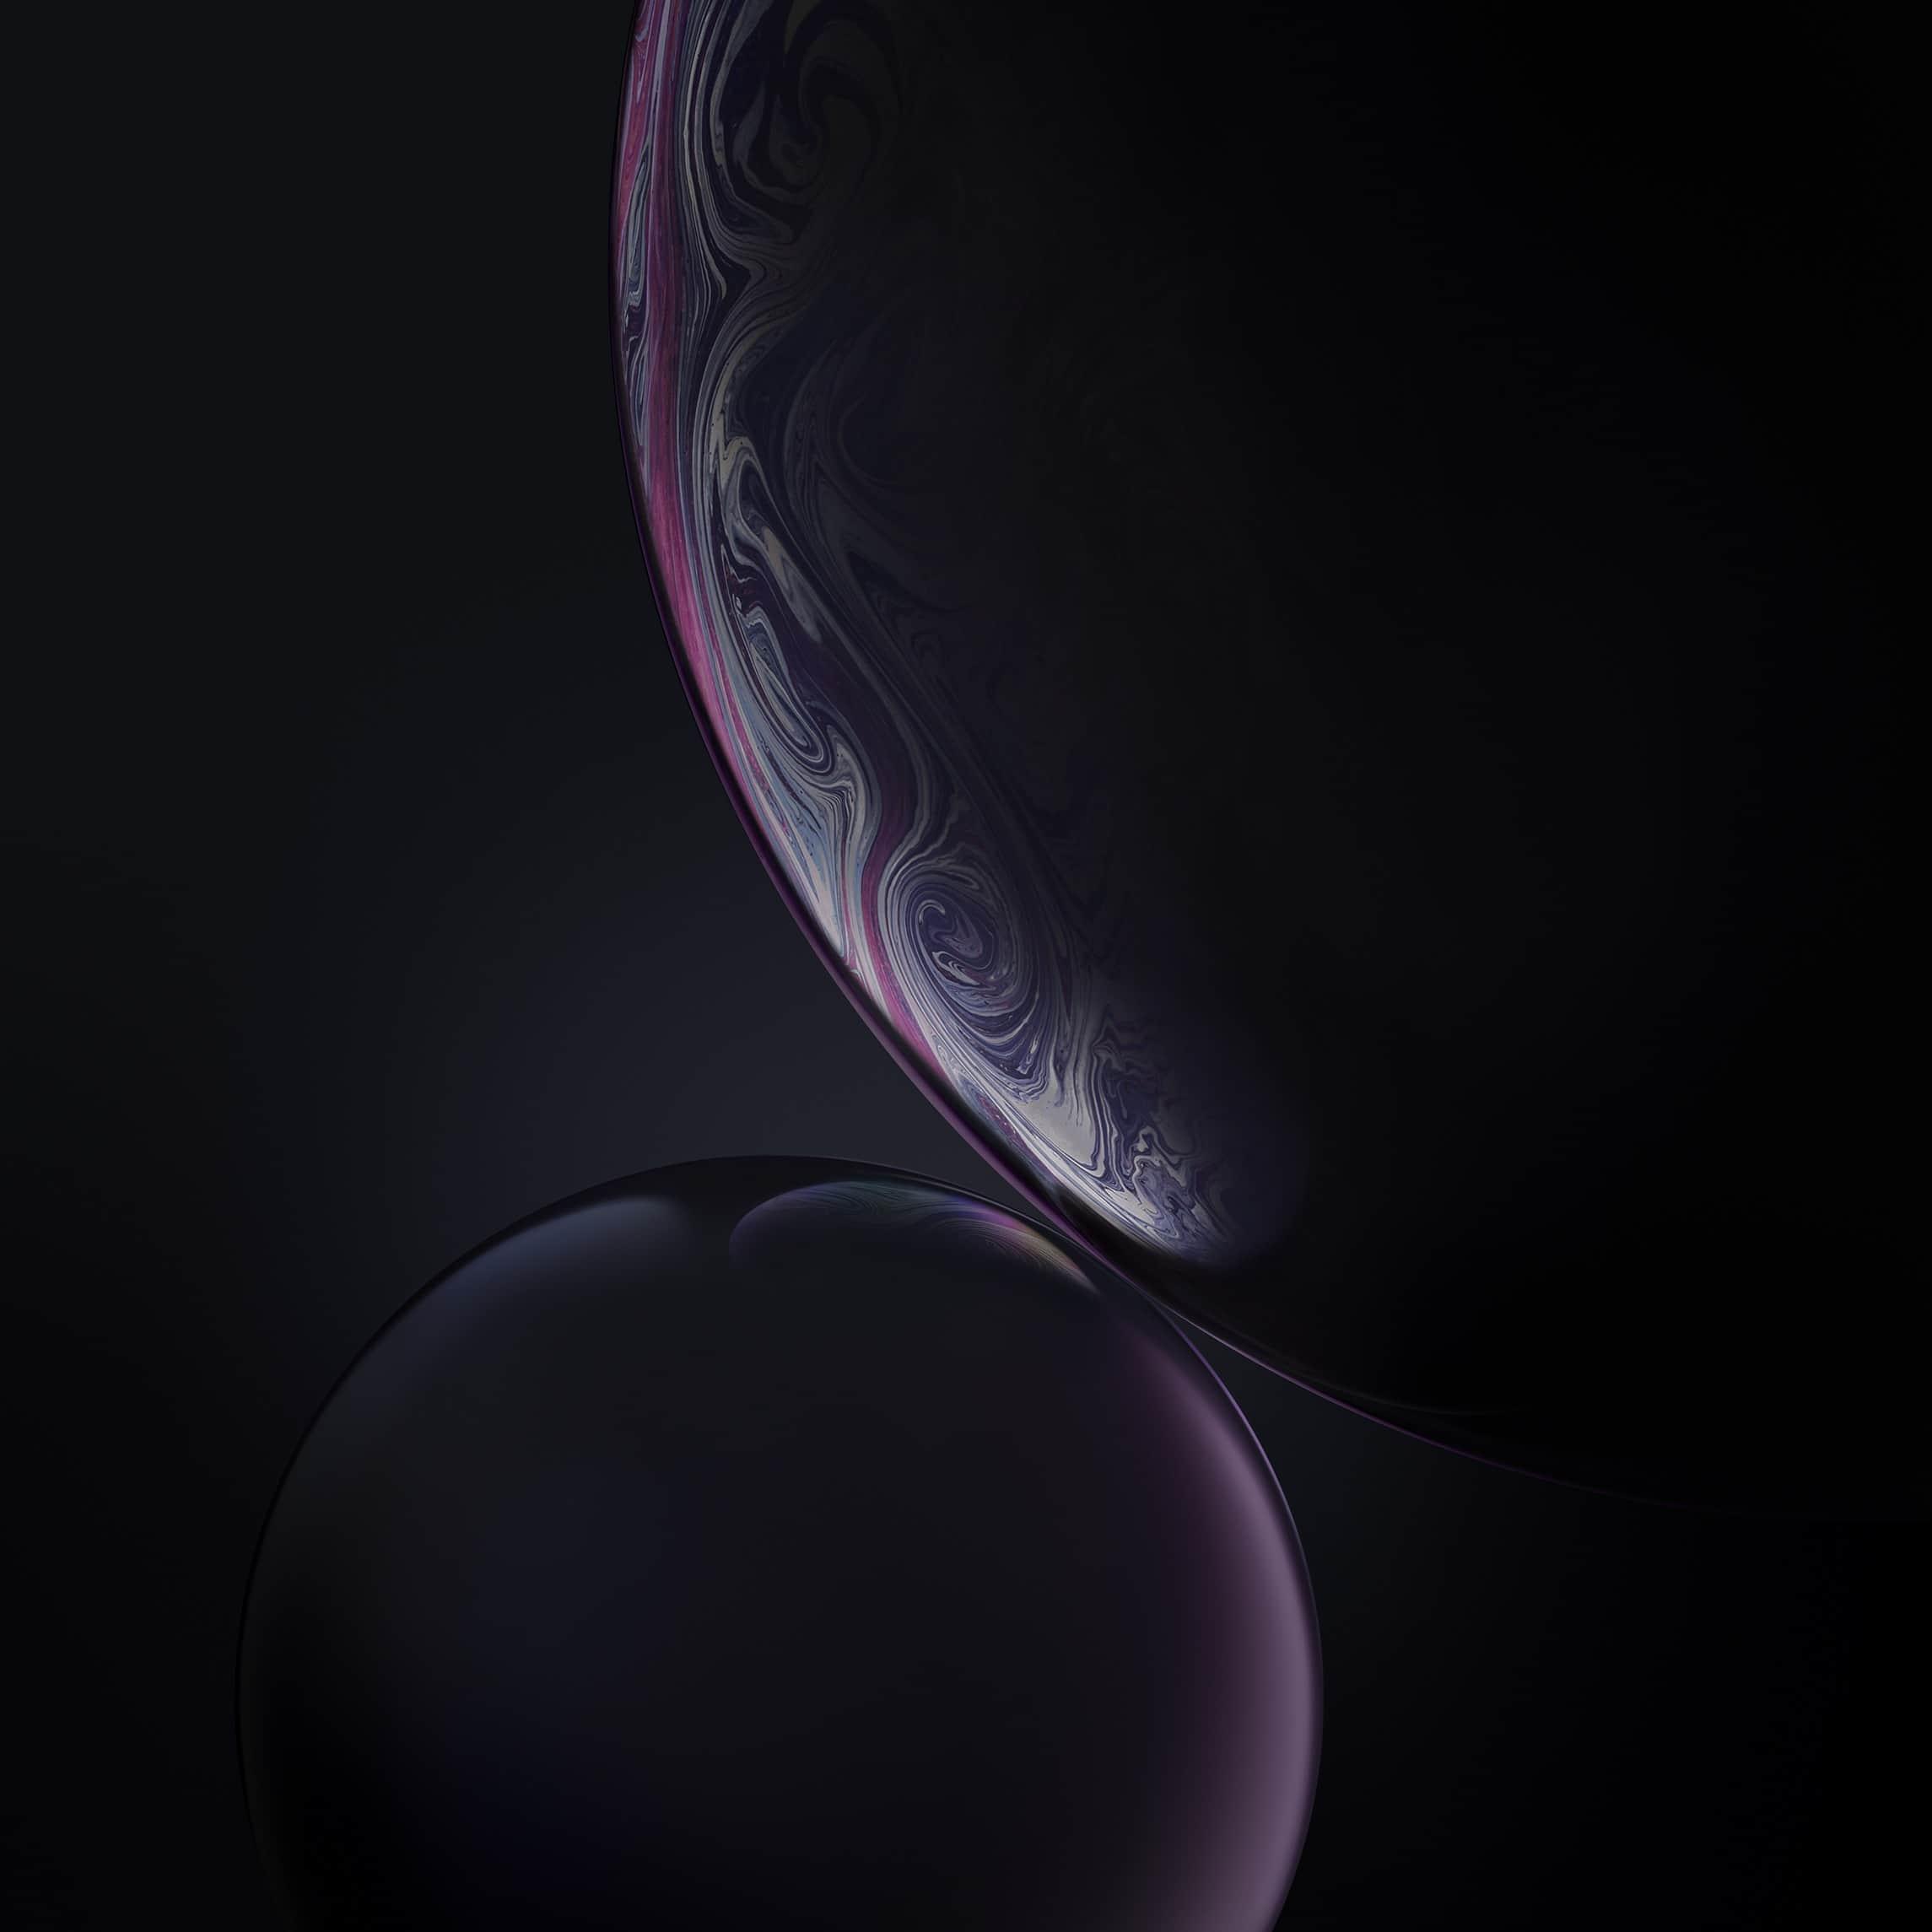 Apple screen background